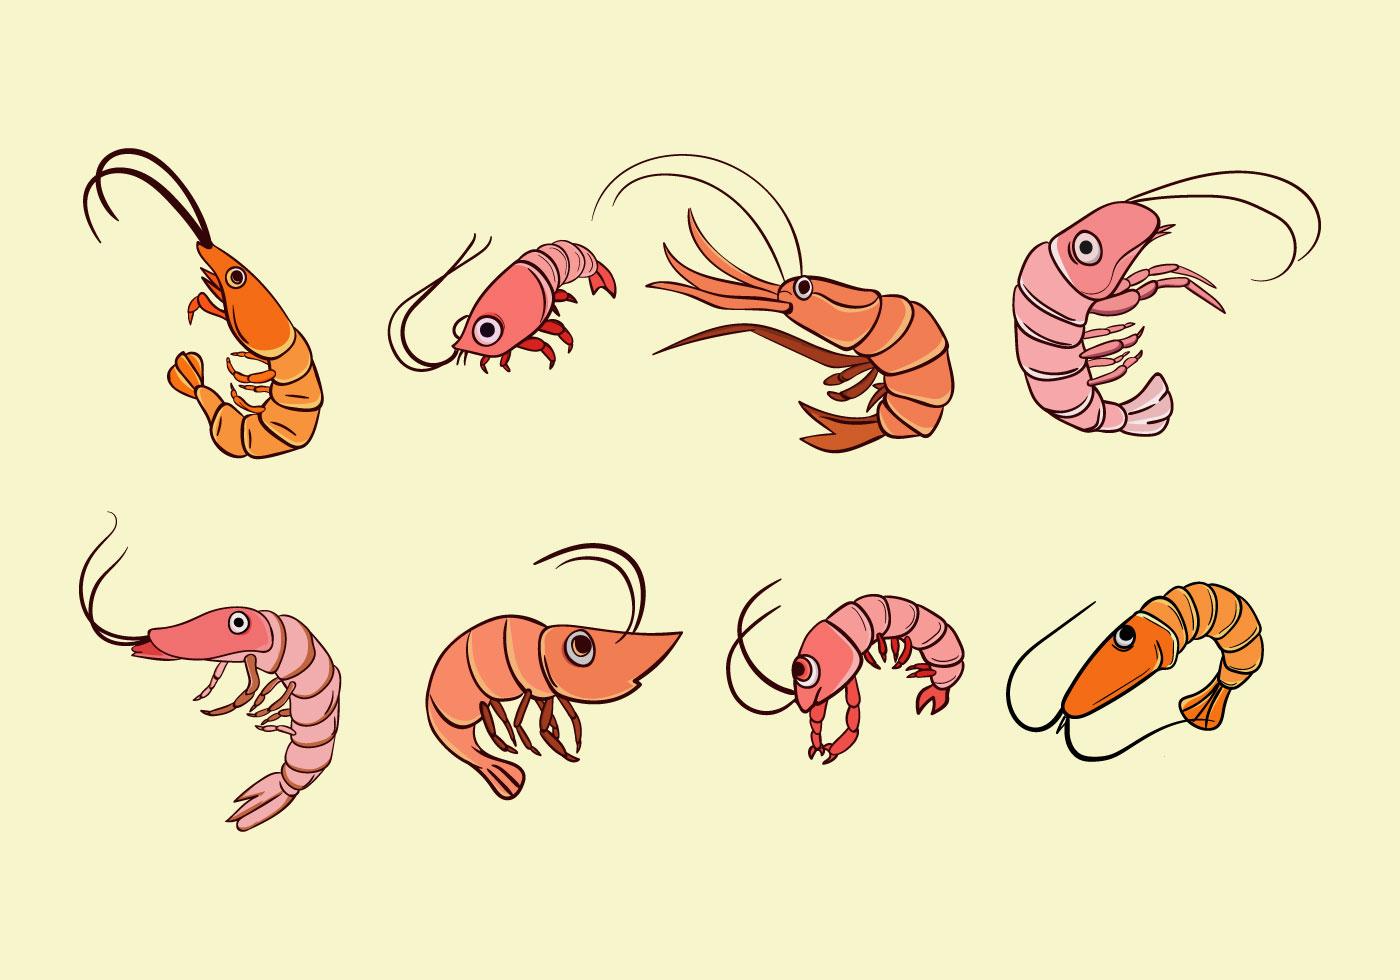 Jumbo shrimp moscato cocktail